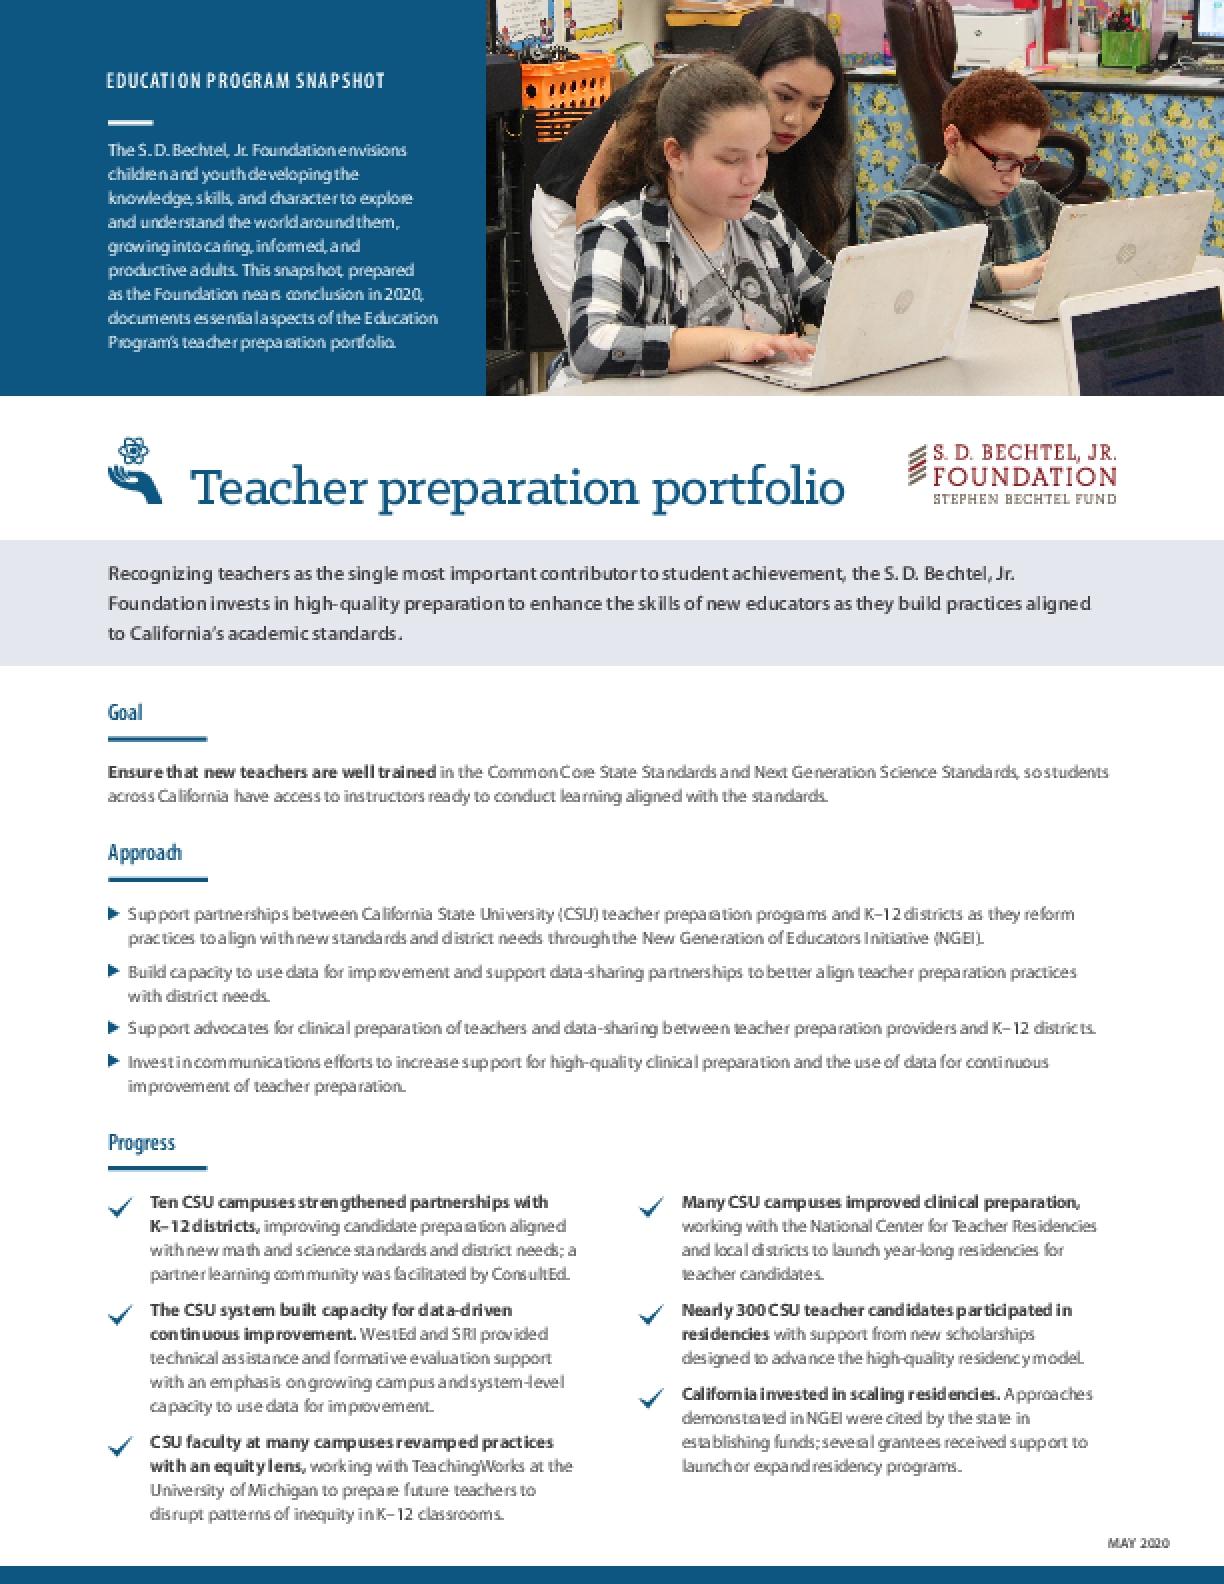 Education Program Snapshot: Teacher Preparation Portfolio